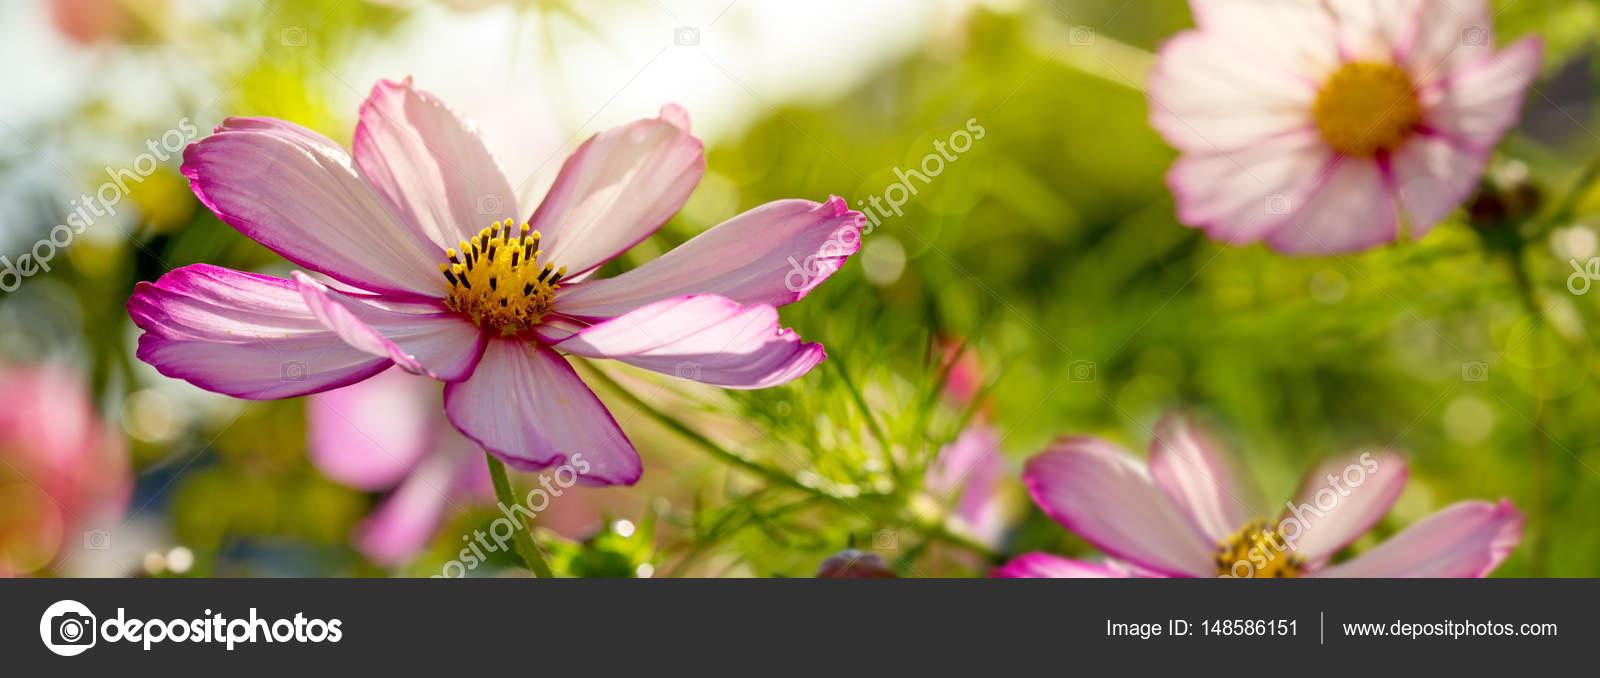 Macro Shot Of White Cosmos Flowers Stock Photo Swkunst 148586151